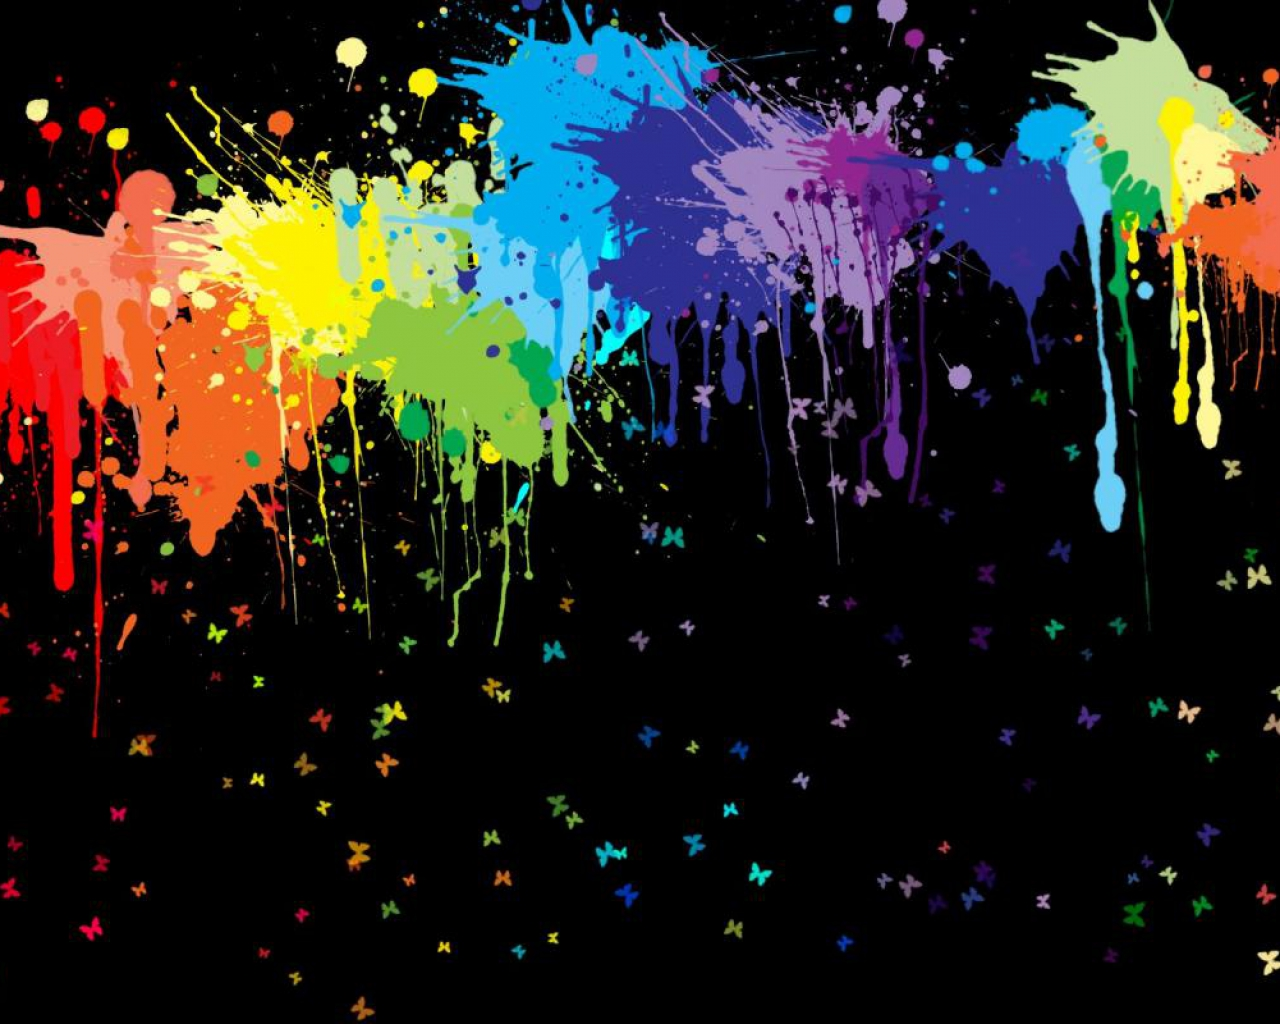 http://1.bp.blogspot.com/-hNp8rp2G52Y/T92XDm5EL-I/AAAAAAAAG-c/k3GF6iUdLa0/s1600/Graffiti+Wallpaper+021.jpg